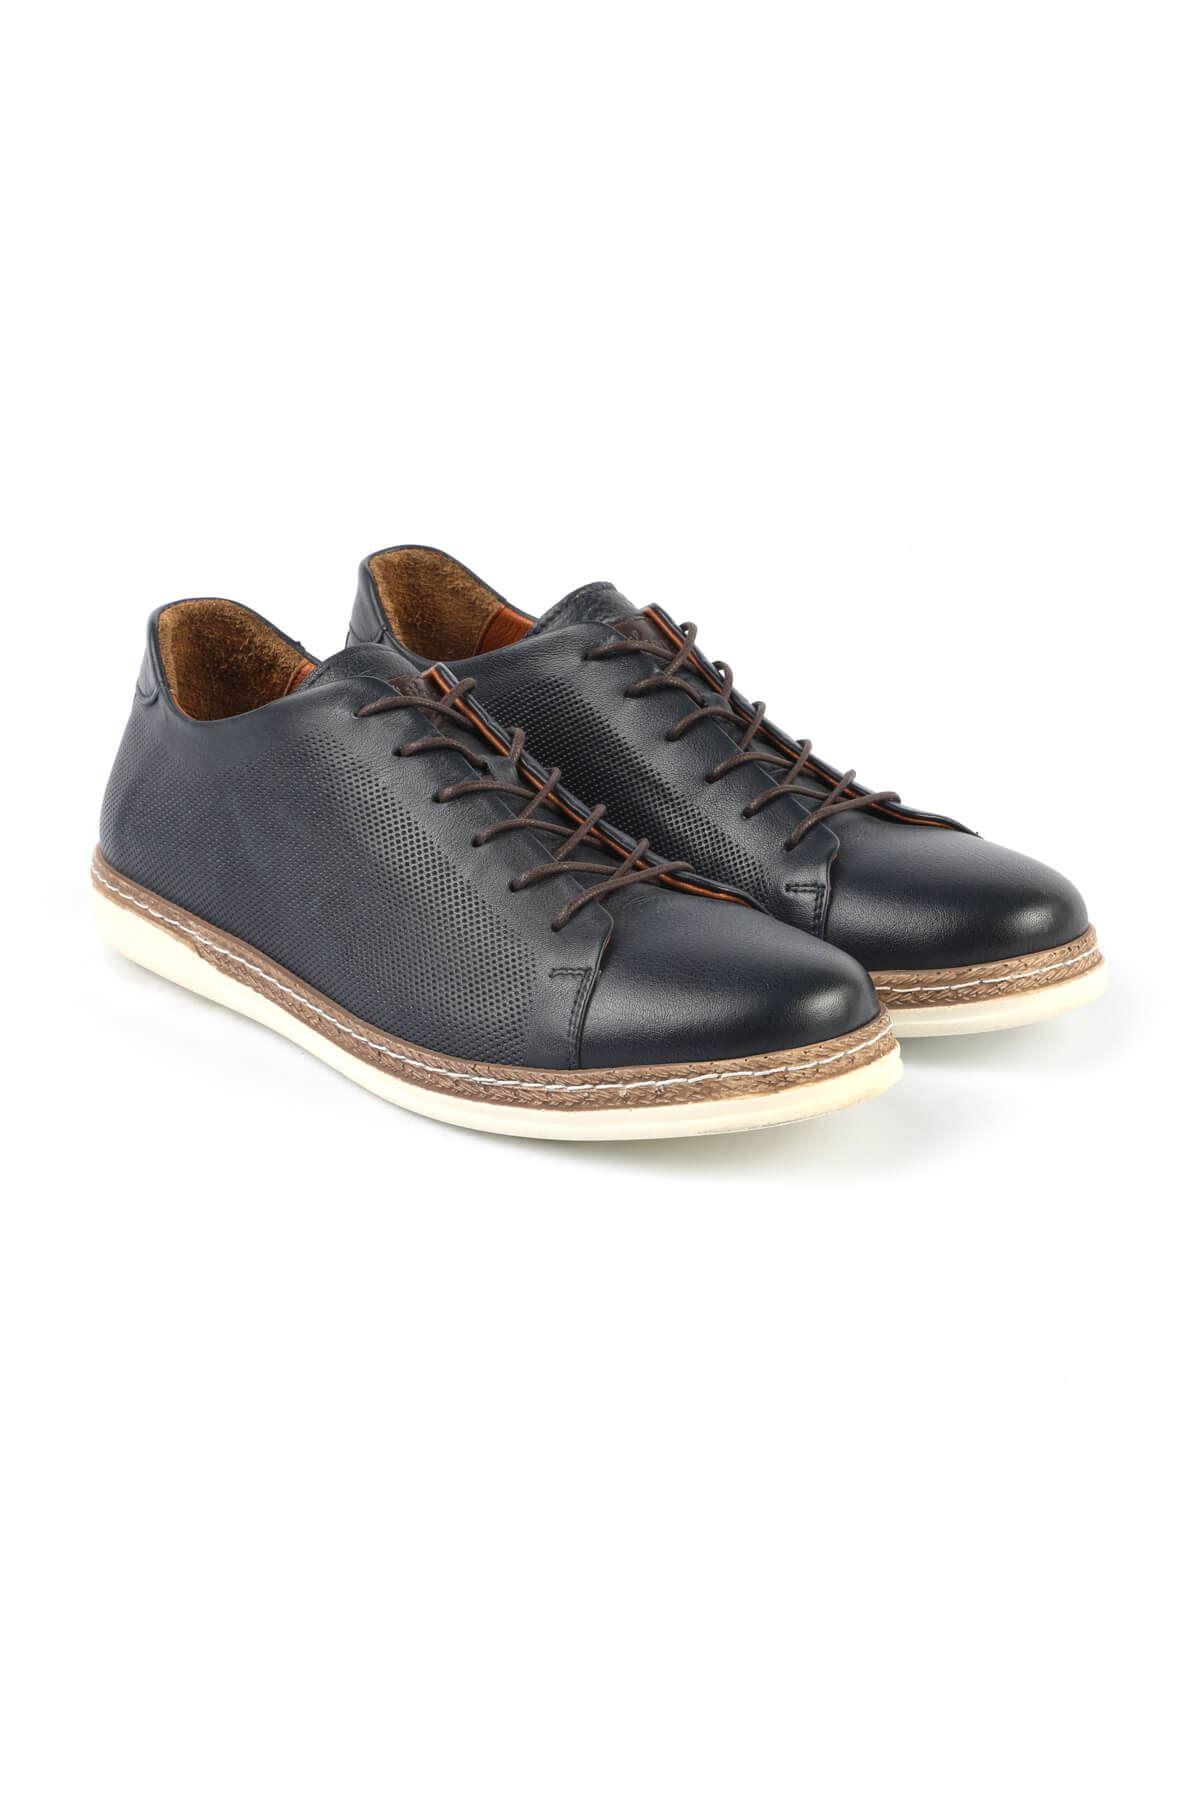 Libero C780 Navy Blue Casual Shoes